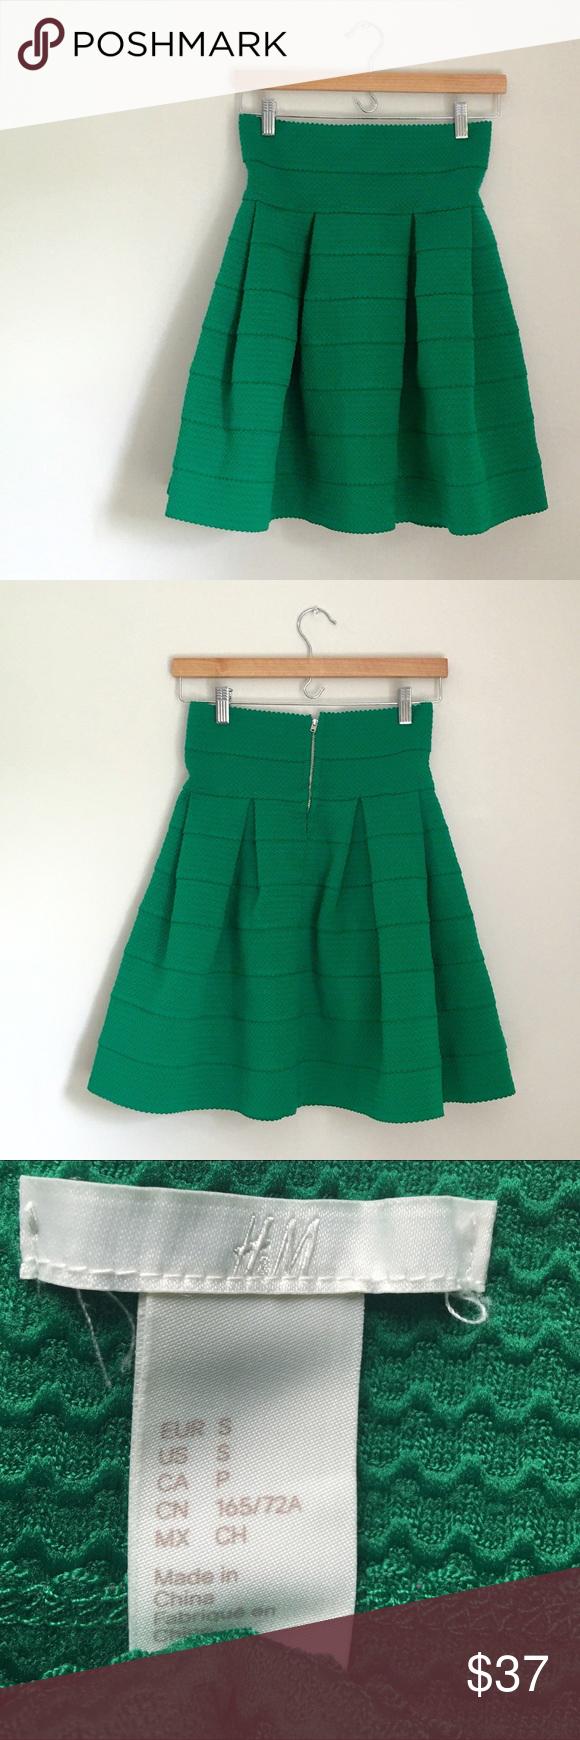 5f53c115b ⏰Sale⏰H&M Elastic Skirt RARE!!! H&M High Waisted Elastic Skirt ...